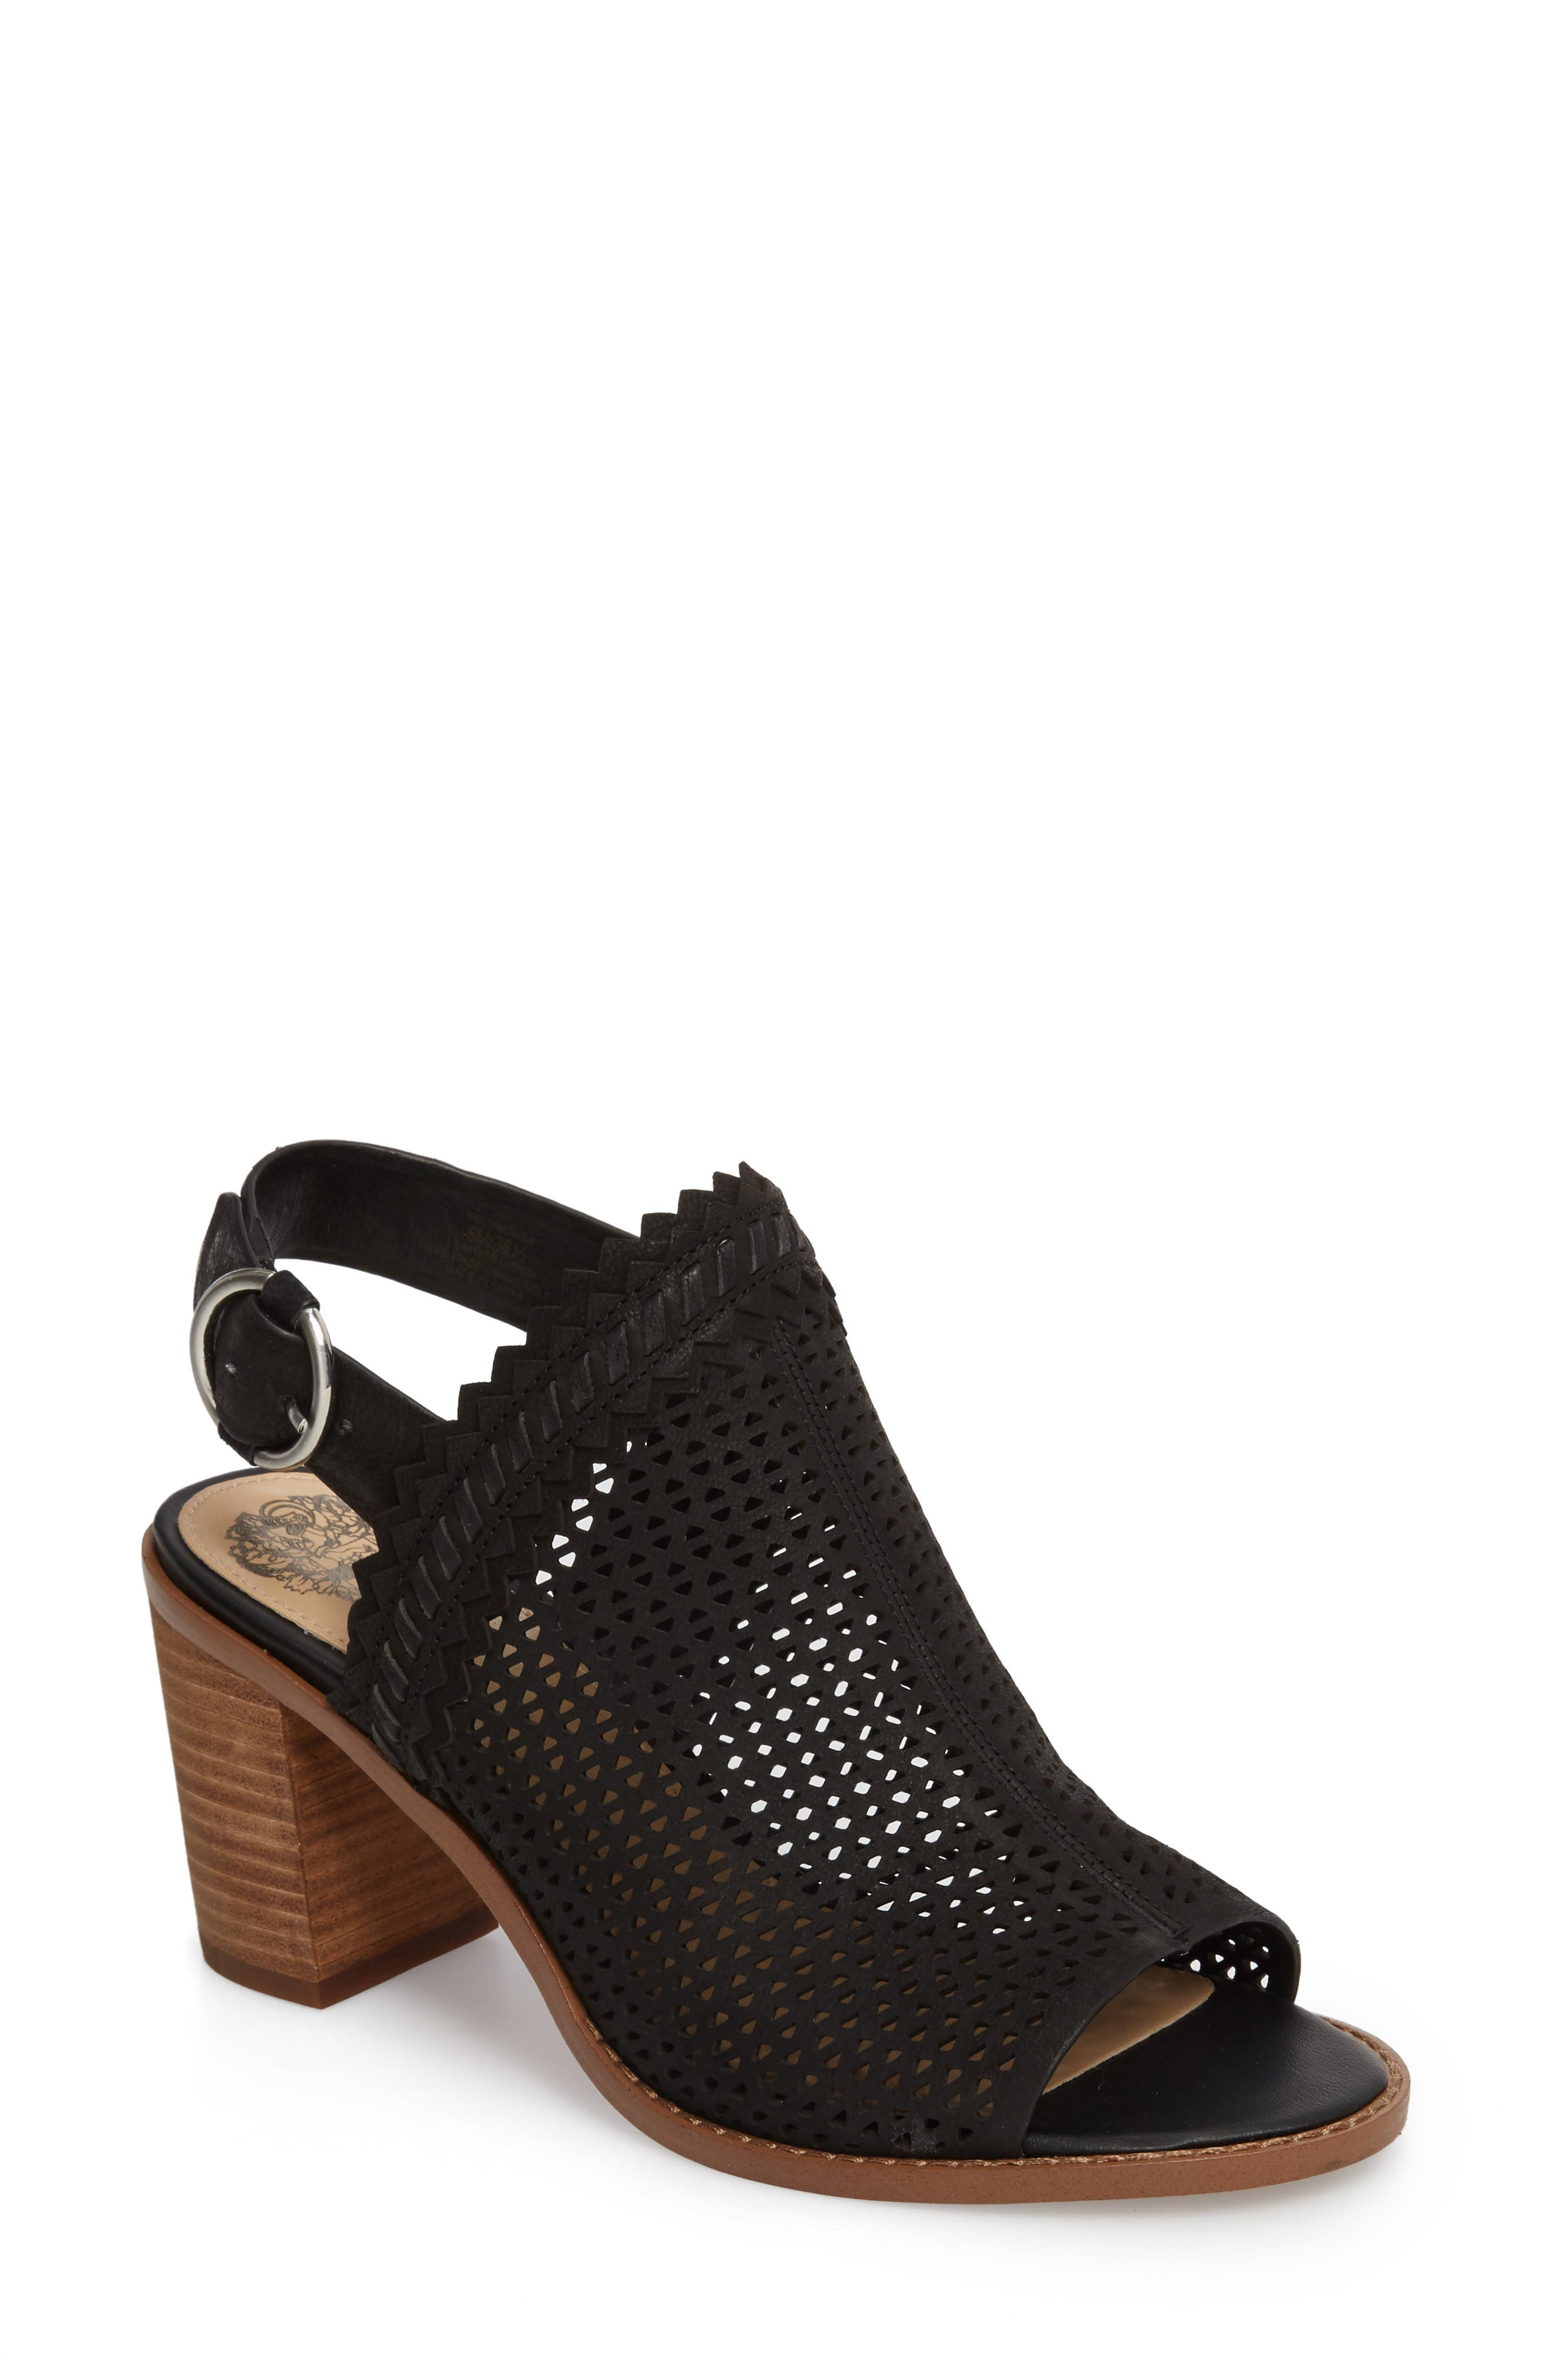 Tricinda Block Heel Sandal,                             Main thumbnail 1, color,                             BLACK LEATHER